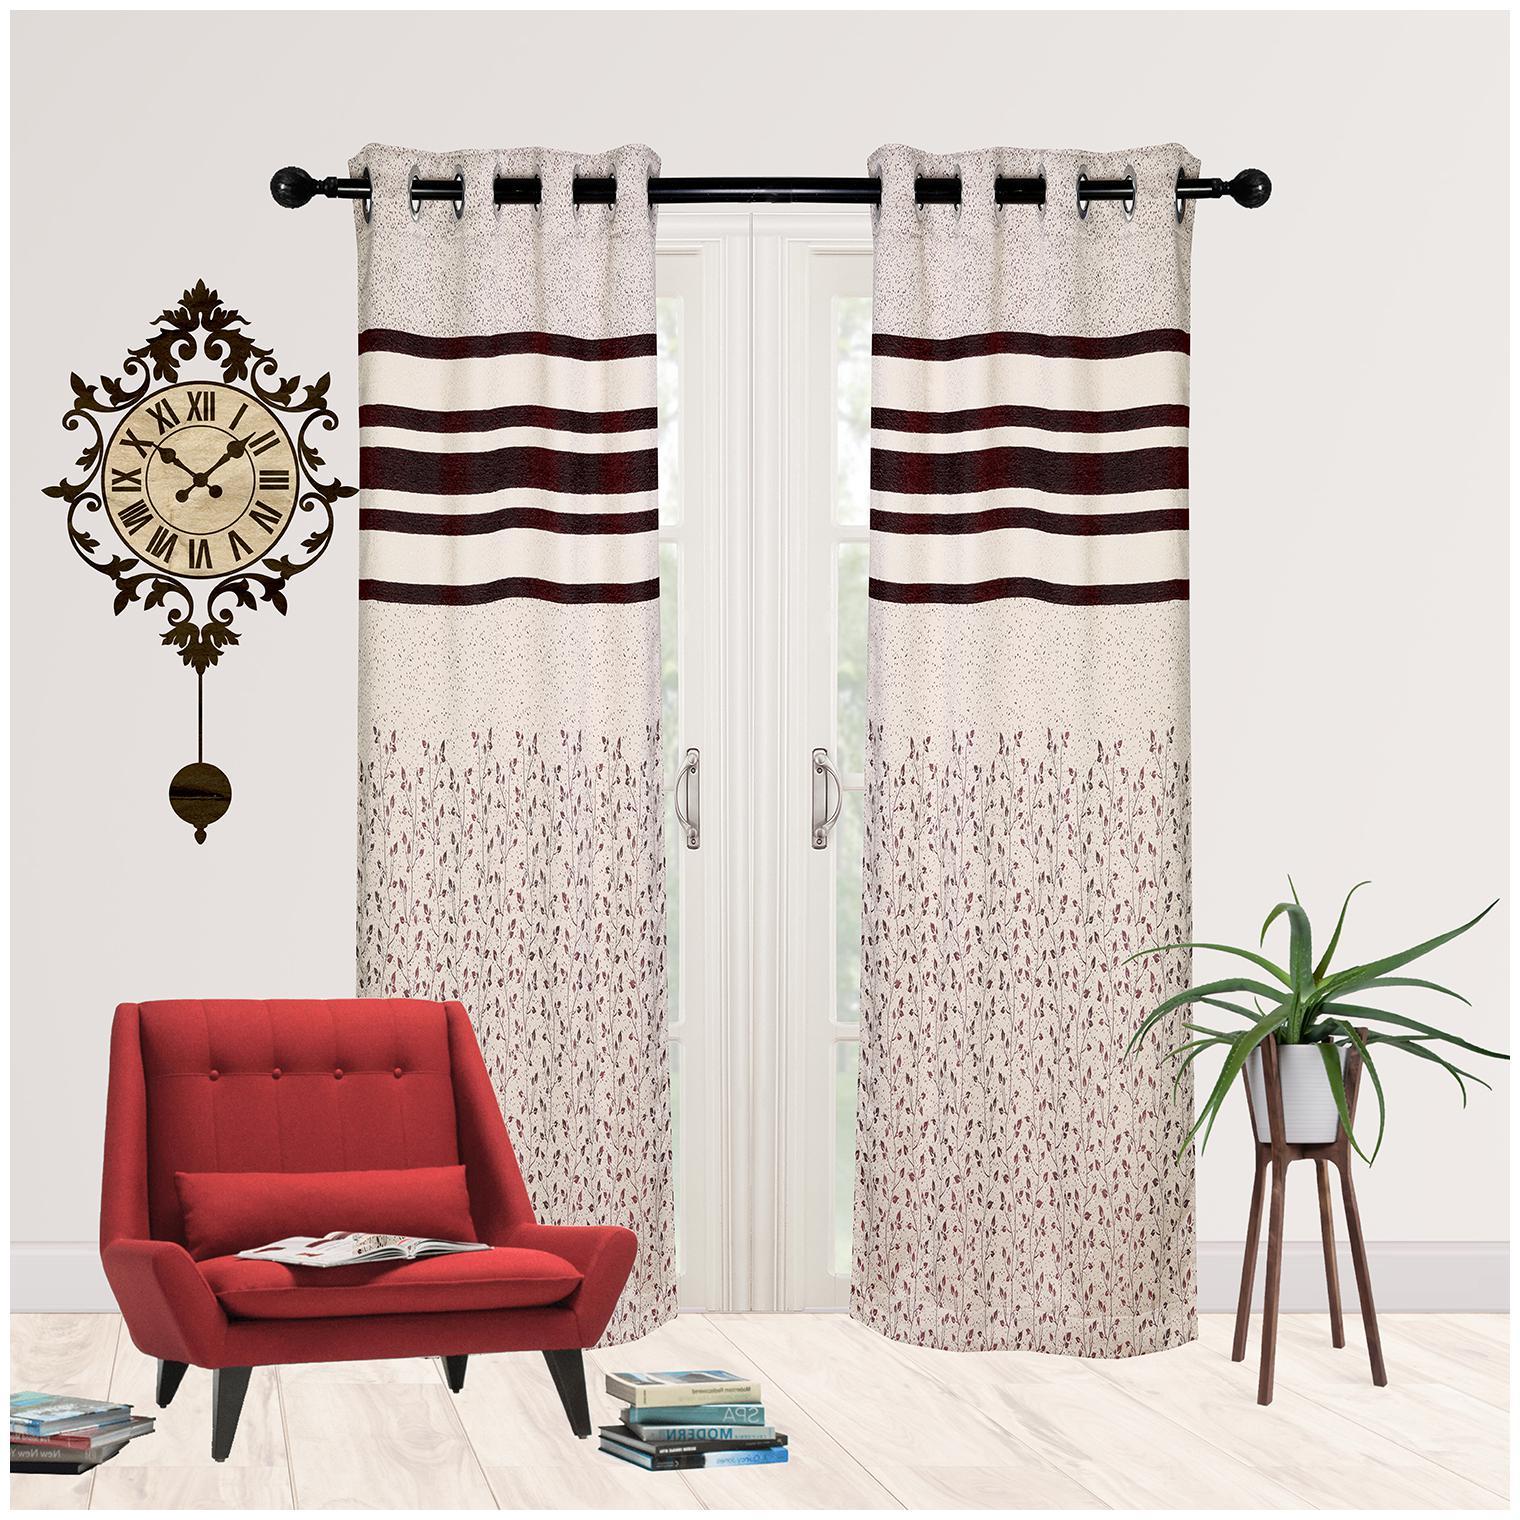 R S Furnishing Jacquard Door Blackout Wine Regular Curtain ( Eyelet Closure...